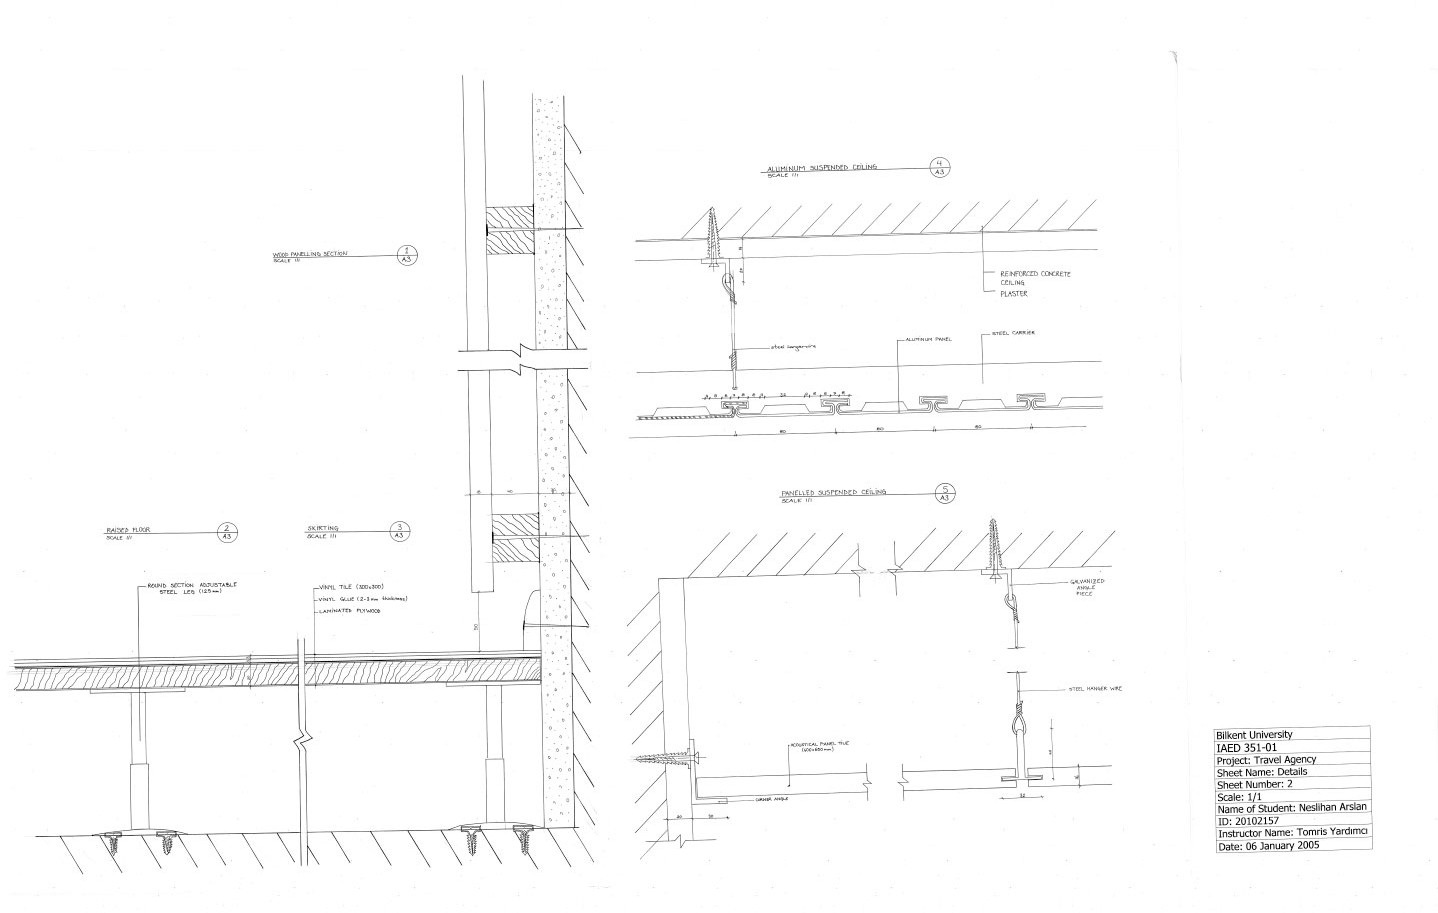 civil draftsman resume - Vaydile.euforic.co